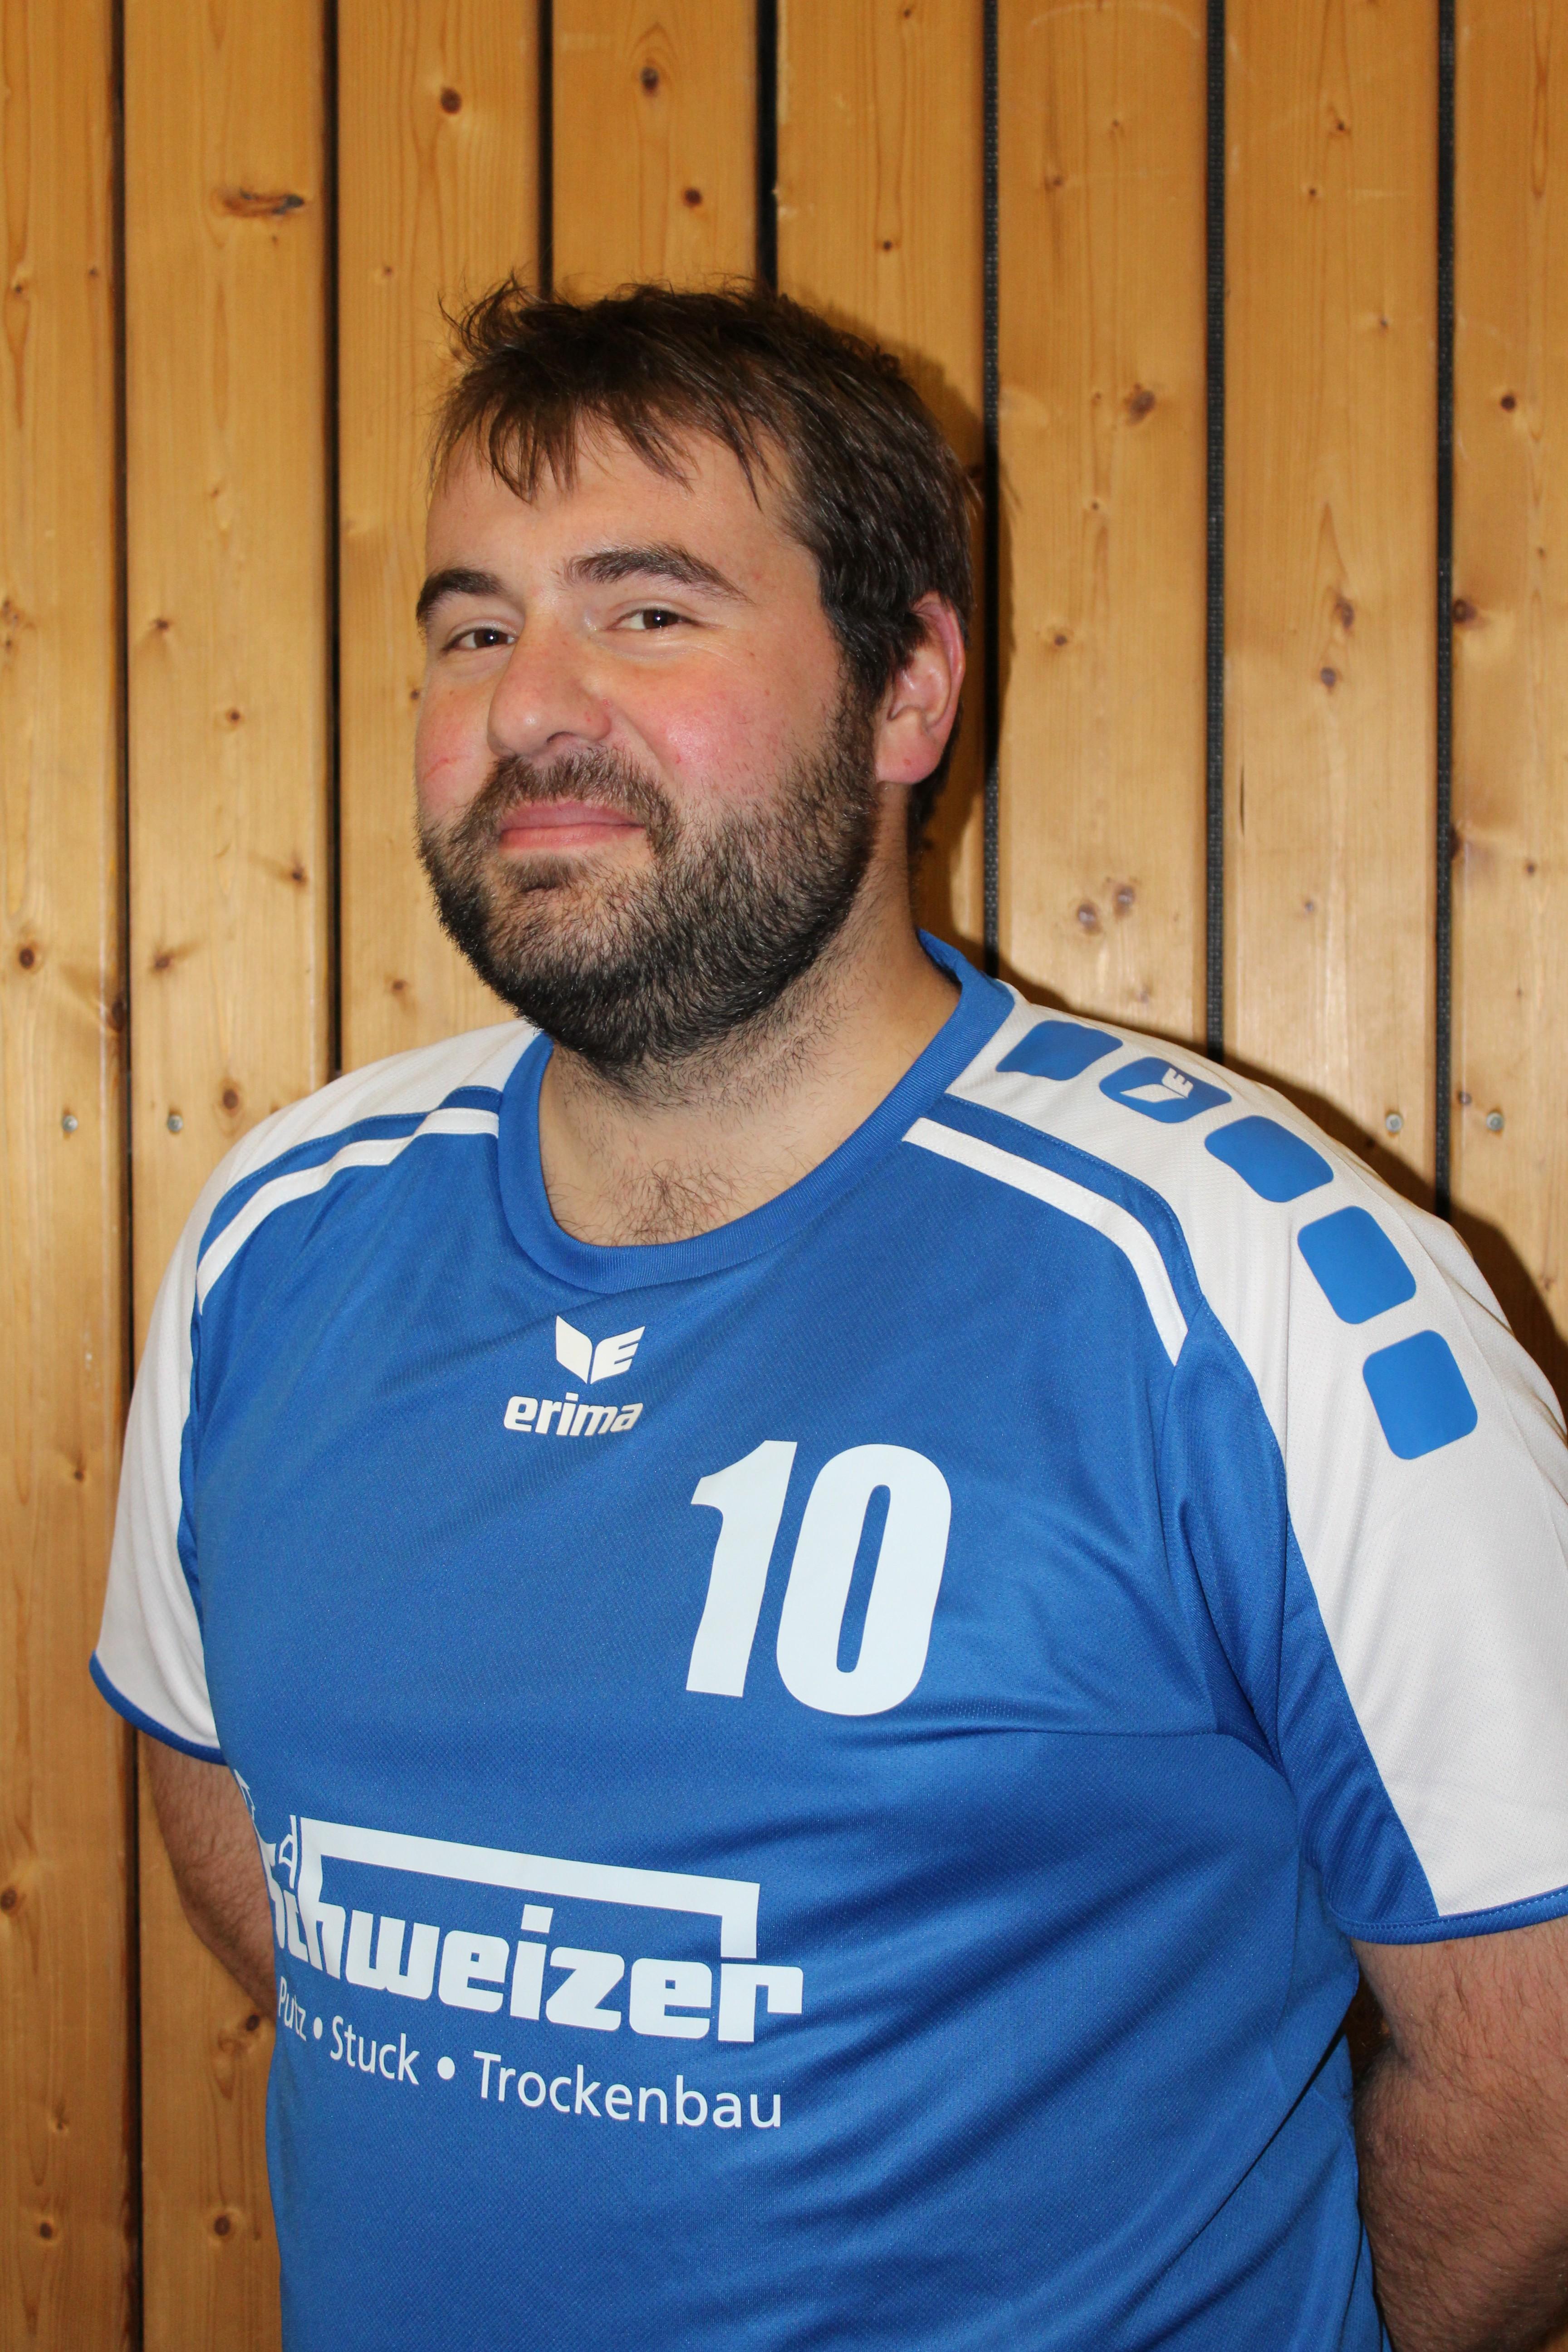 Spieler - Trainer Christoph RIedel Trikotnummer: 10 Position: Universal Größe: